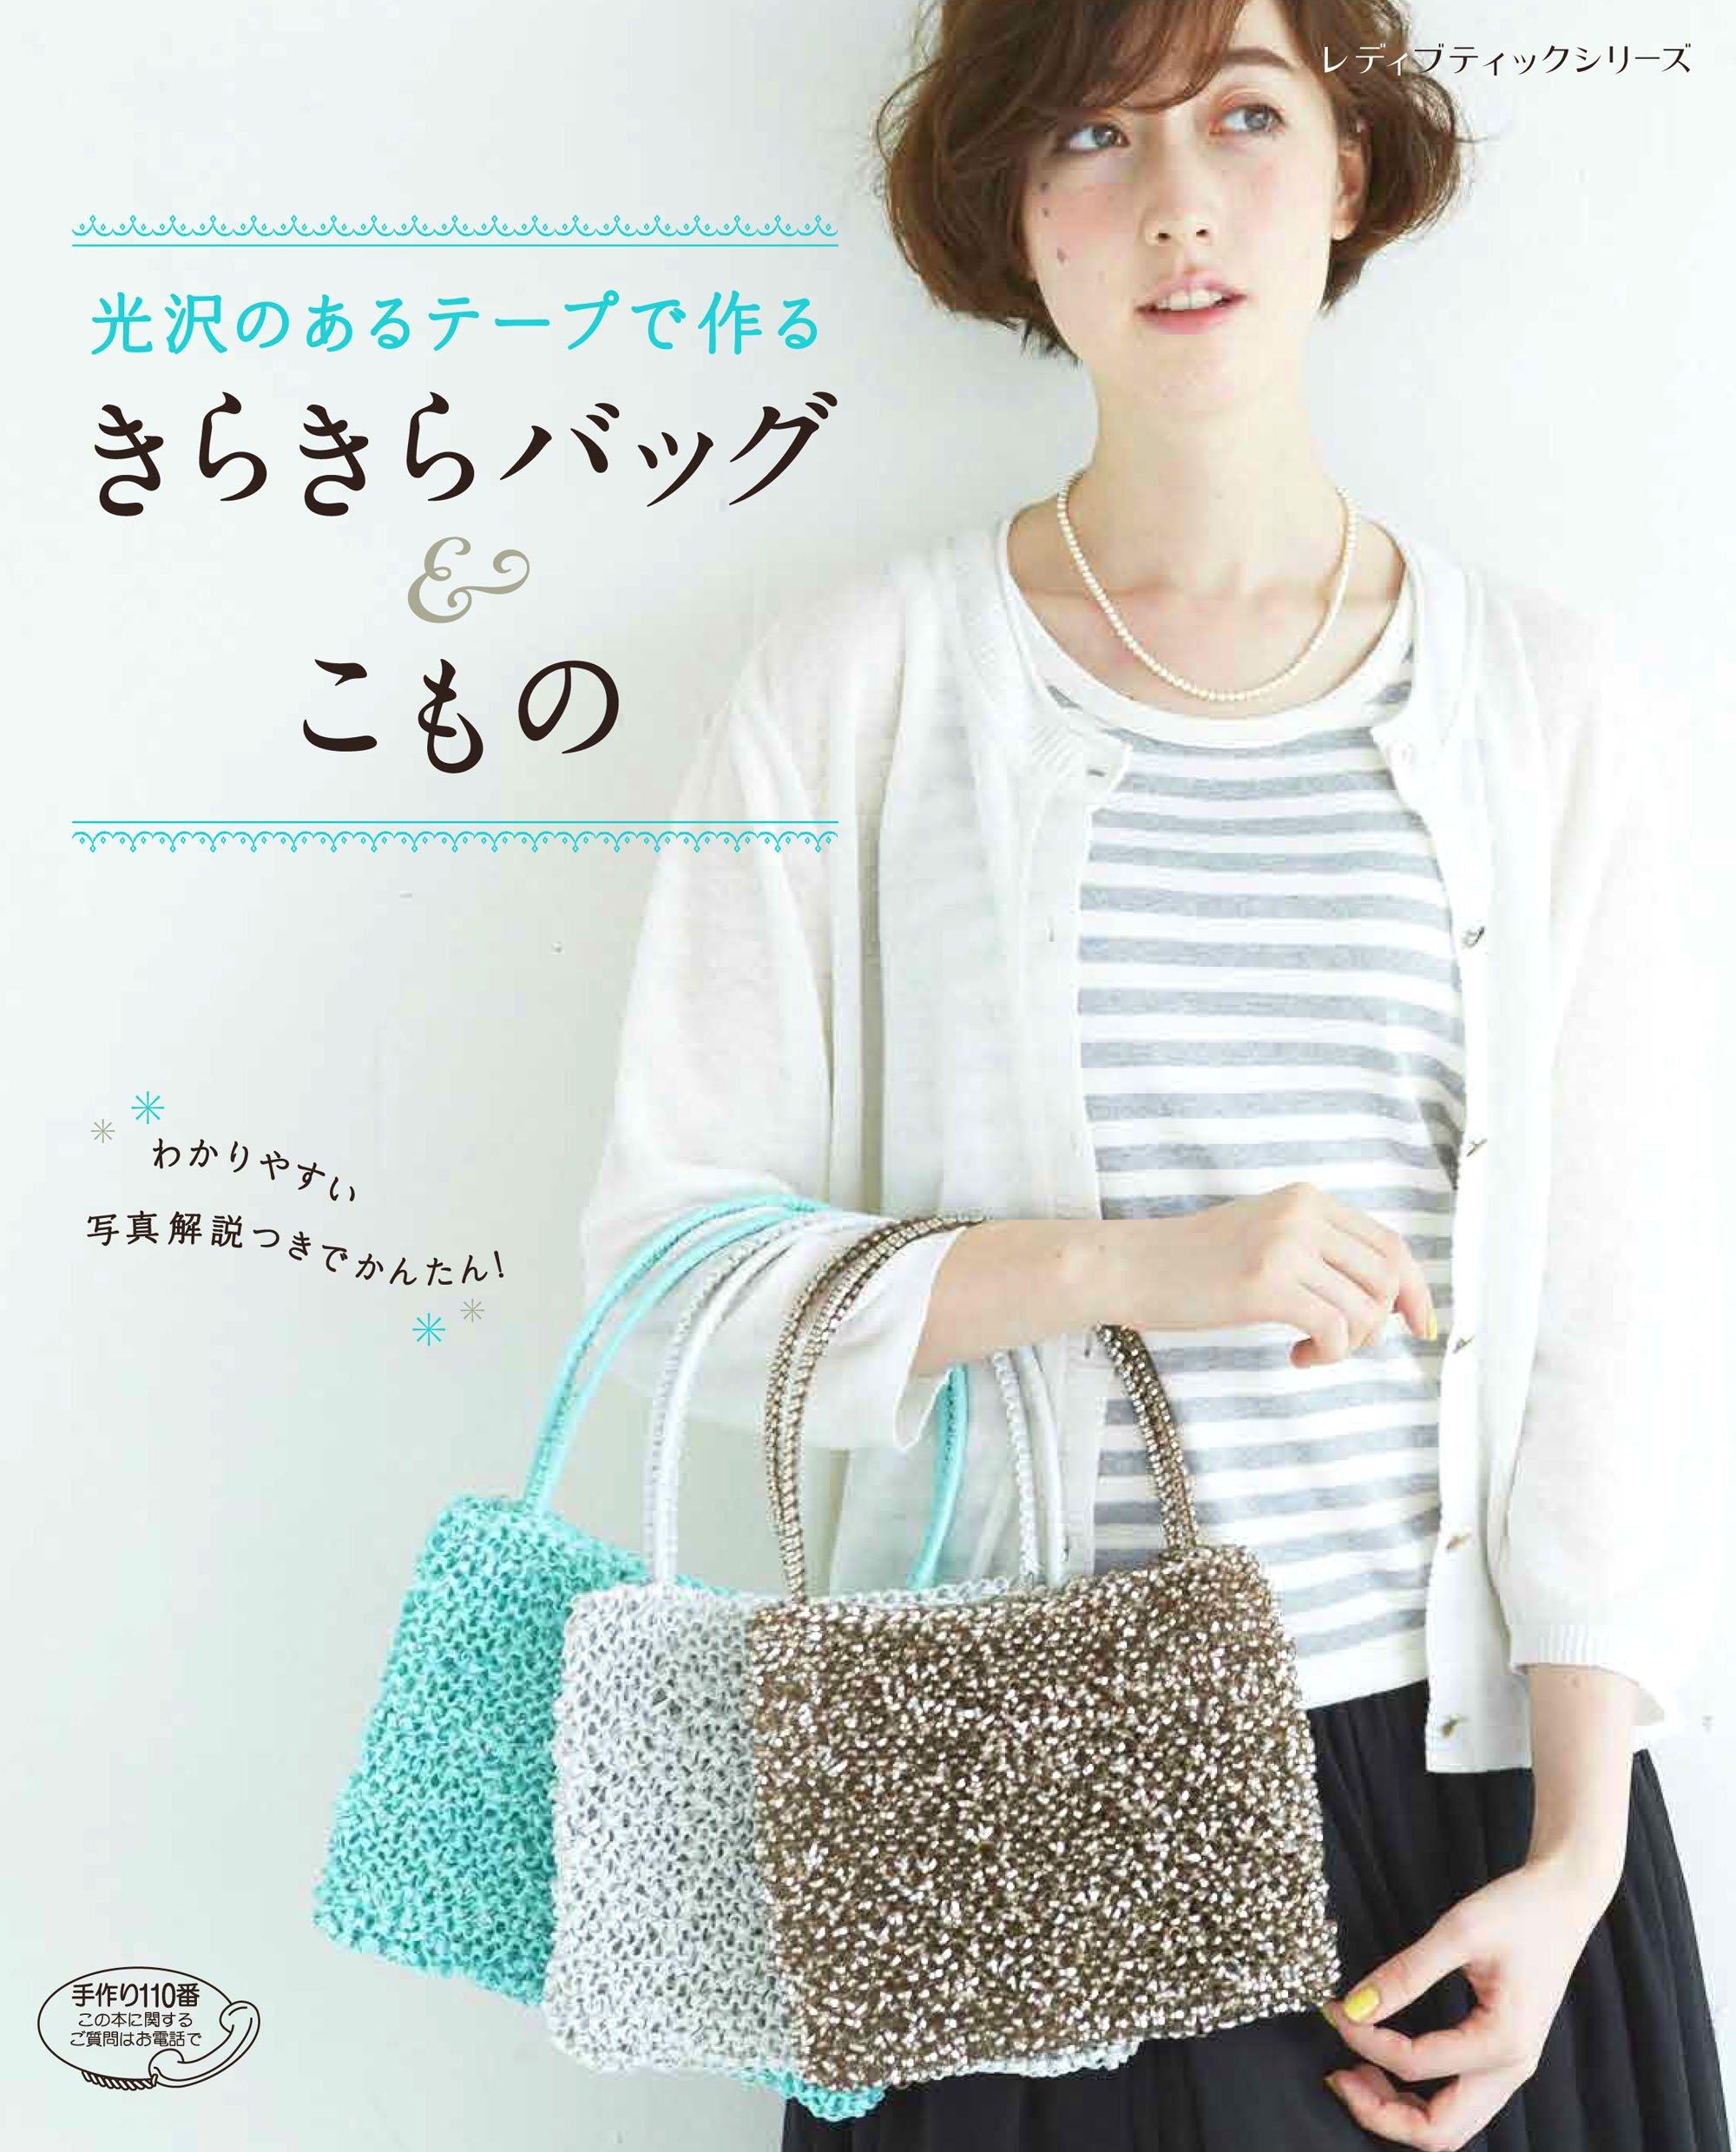 Glitter Bags & Accessories